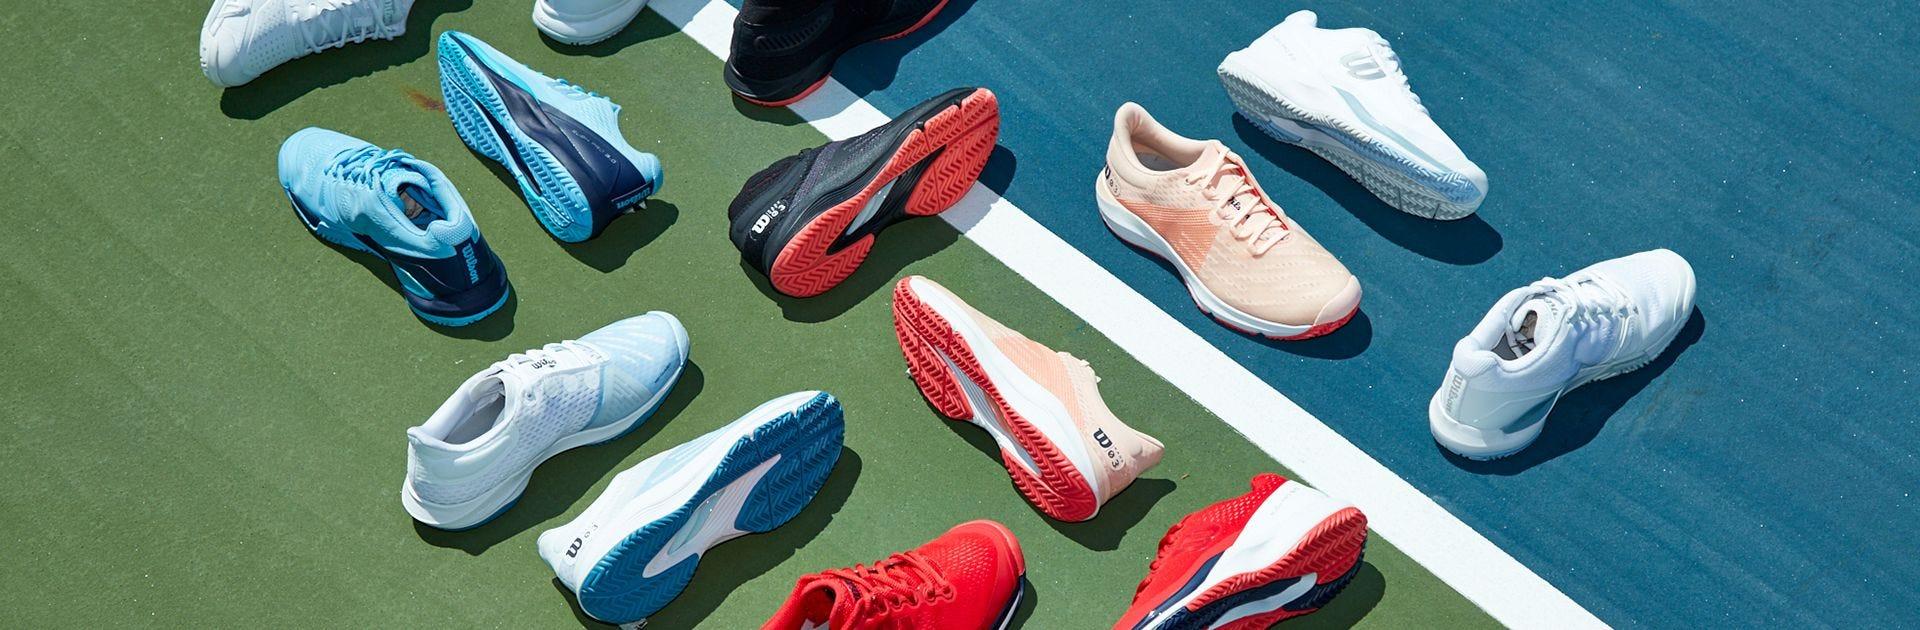 Wilson Women's Shoe Range on Tennis Court